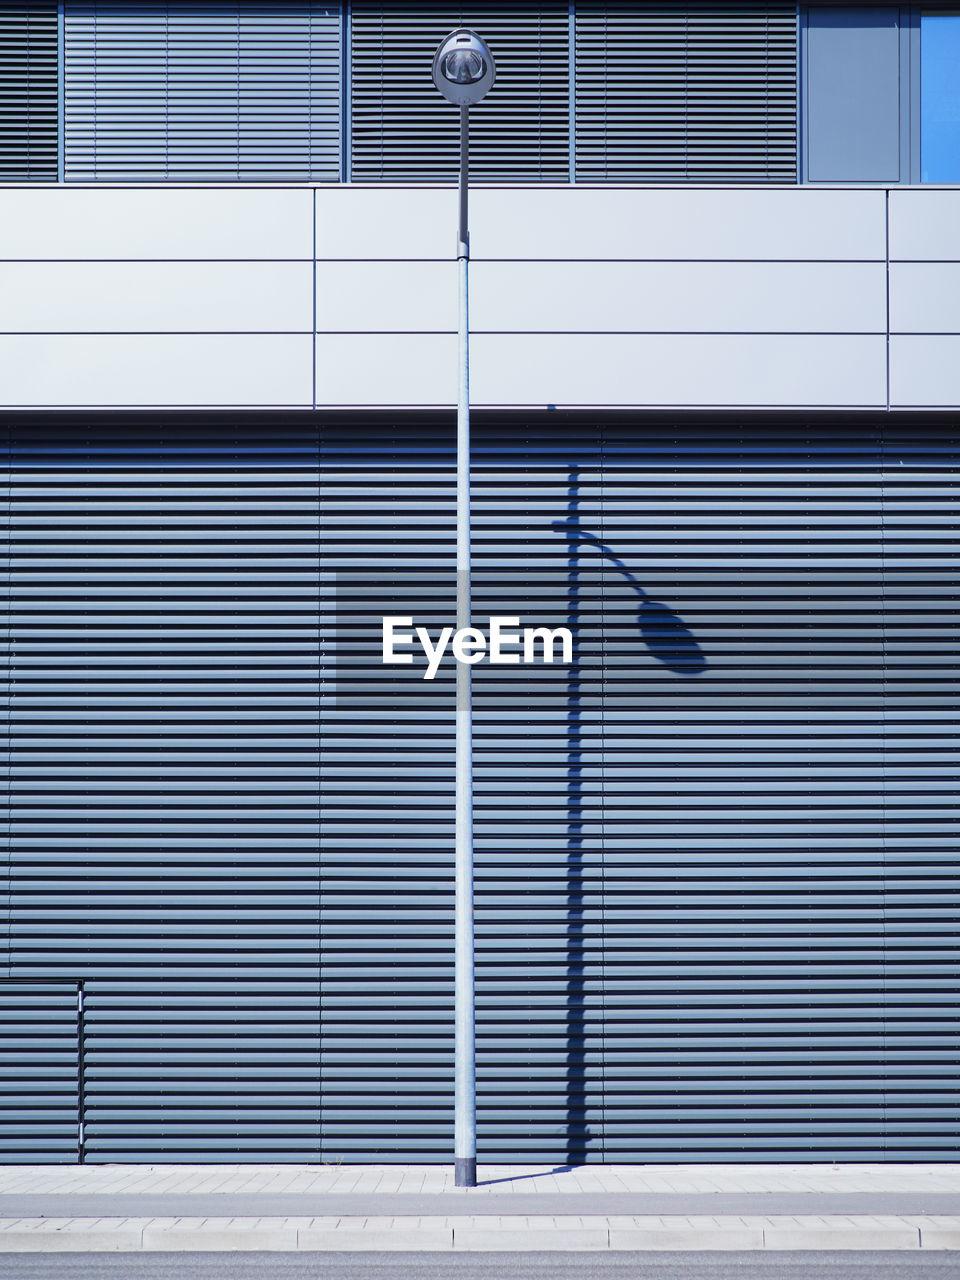 View Of Street Light Against Modern Building